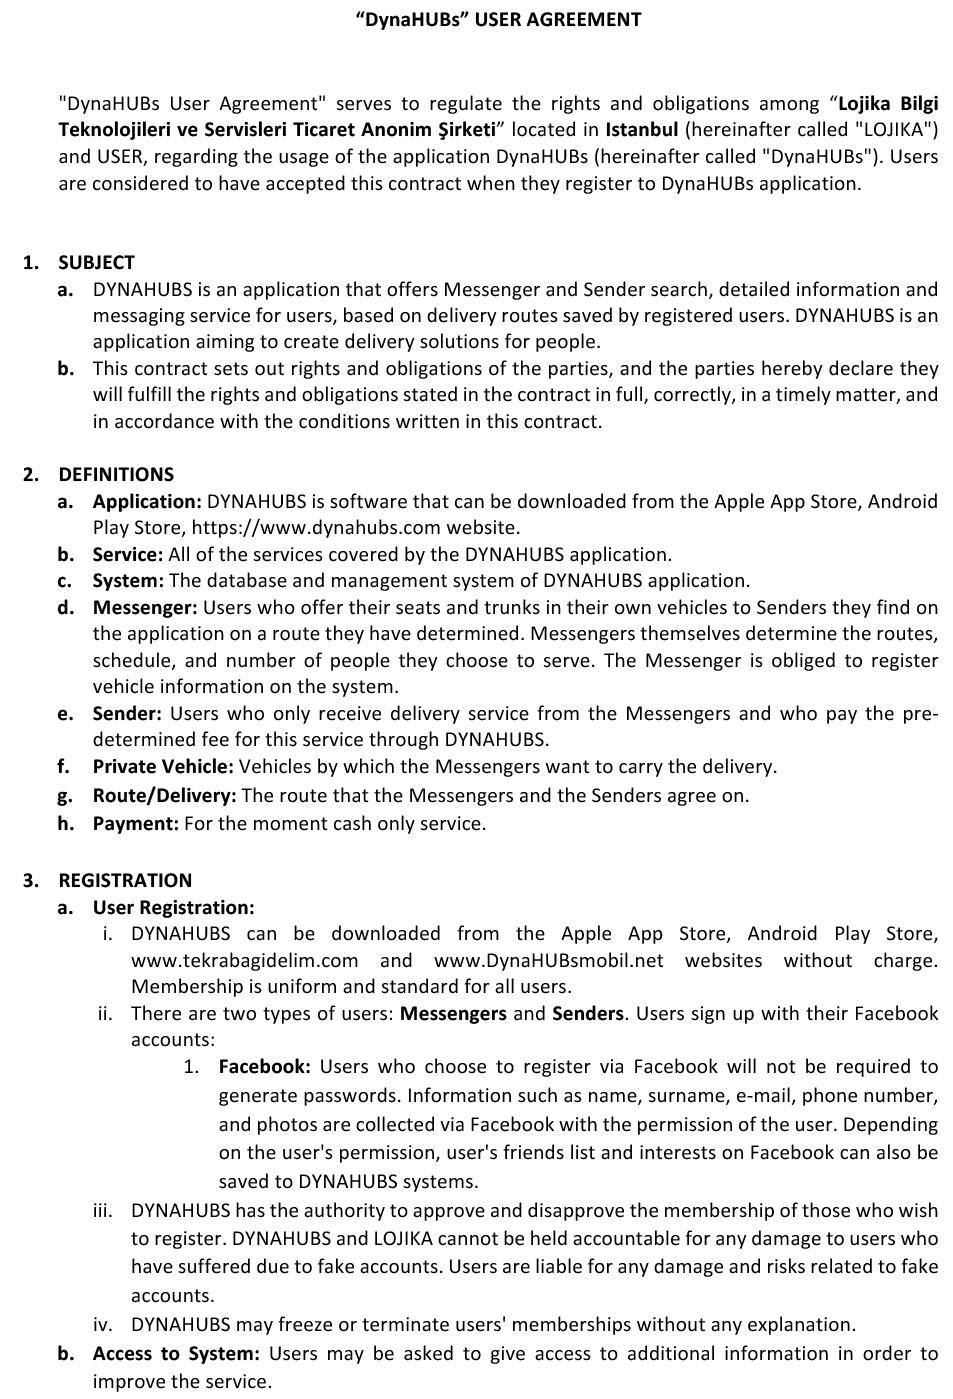 DynaHUBs_User-Agreement_3.1.2017_eng-1.jpg